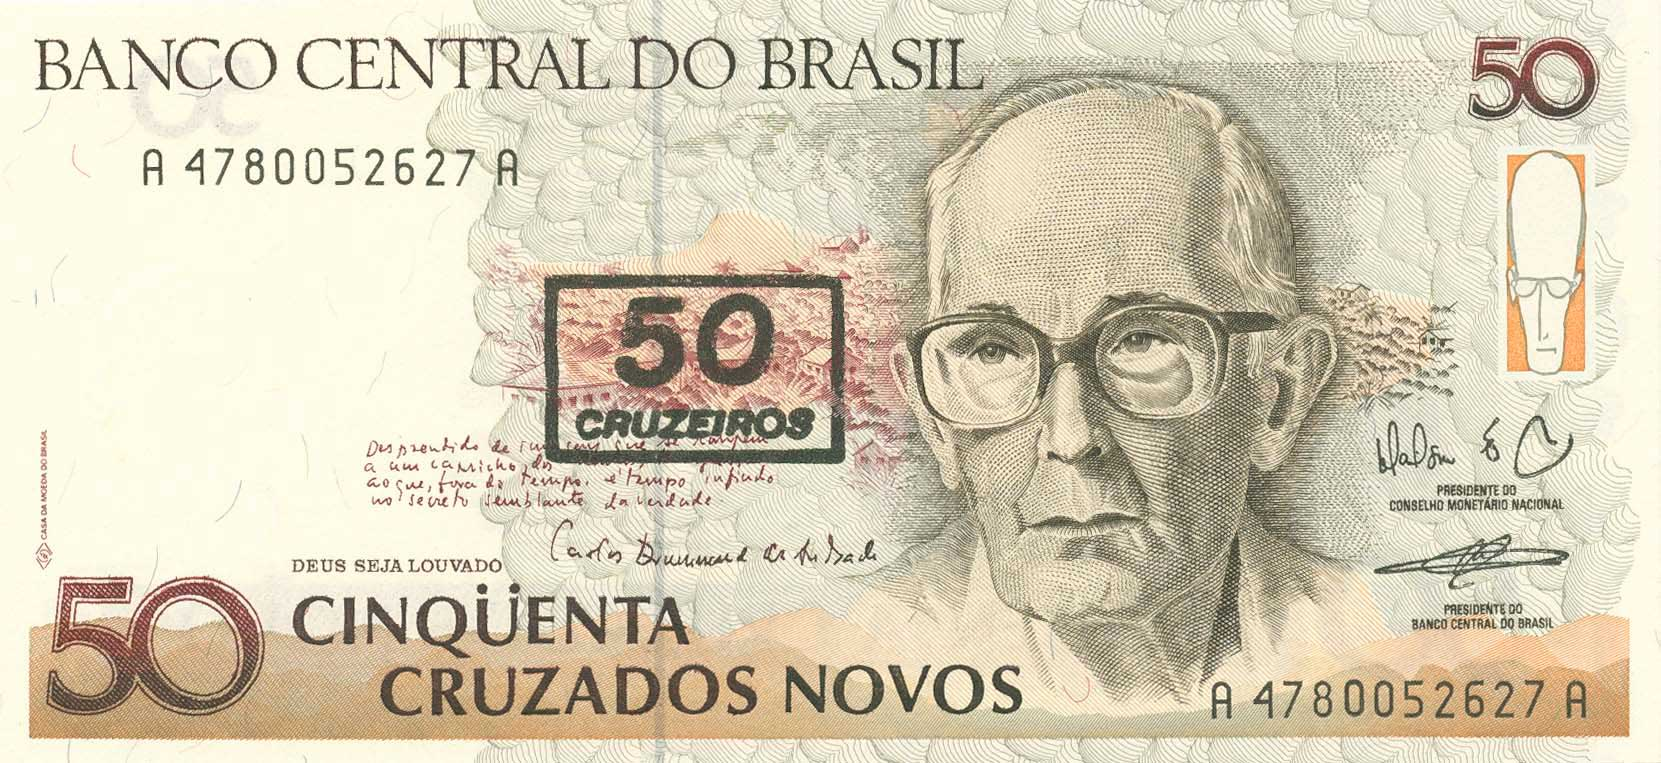 BRA-0223-a